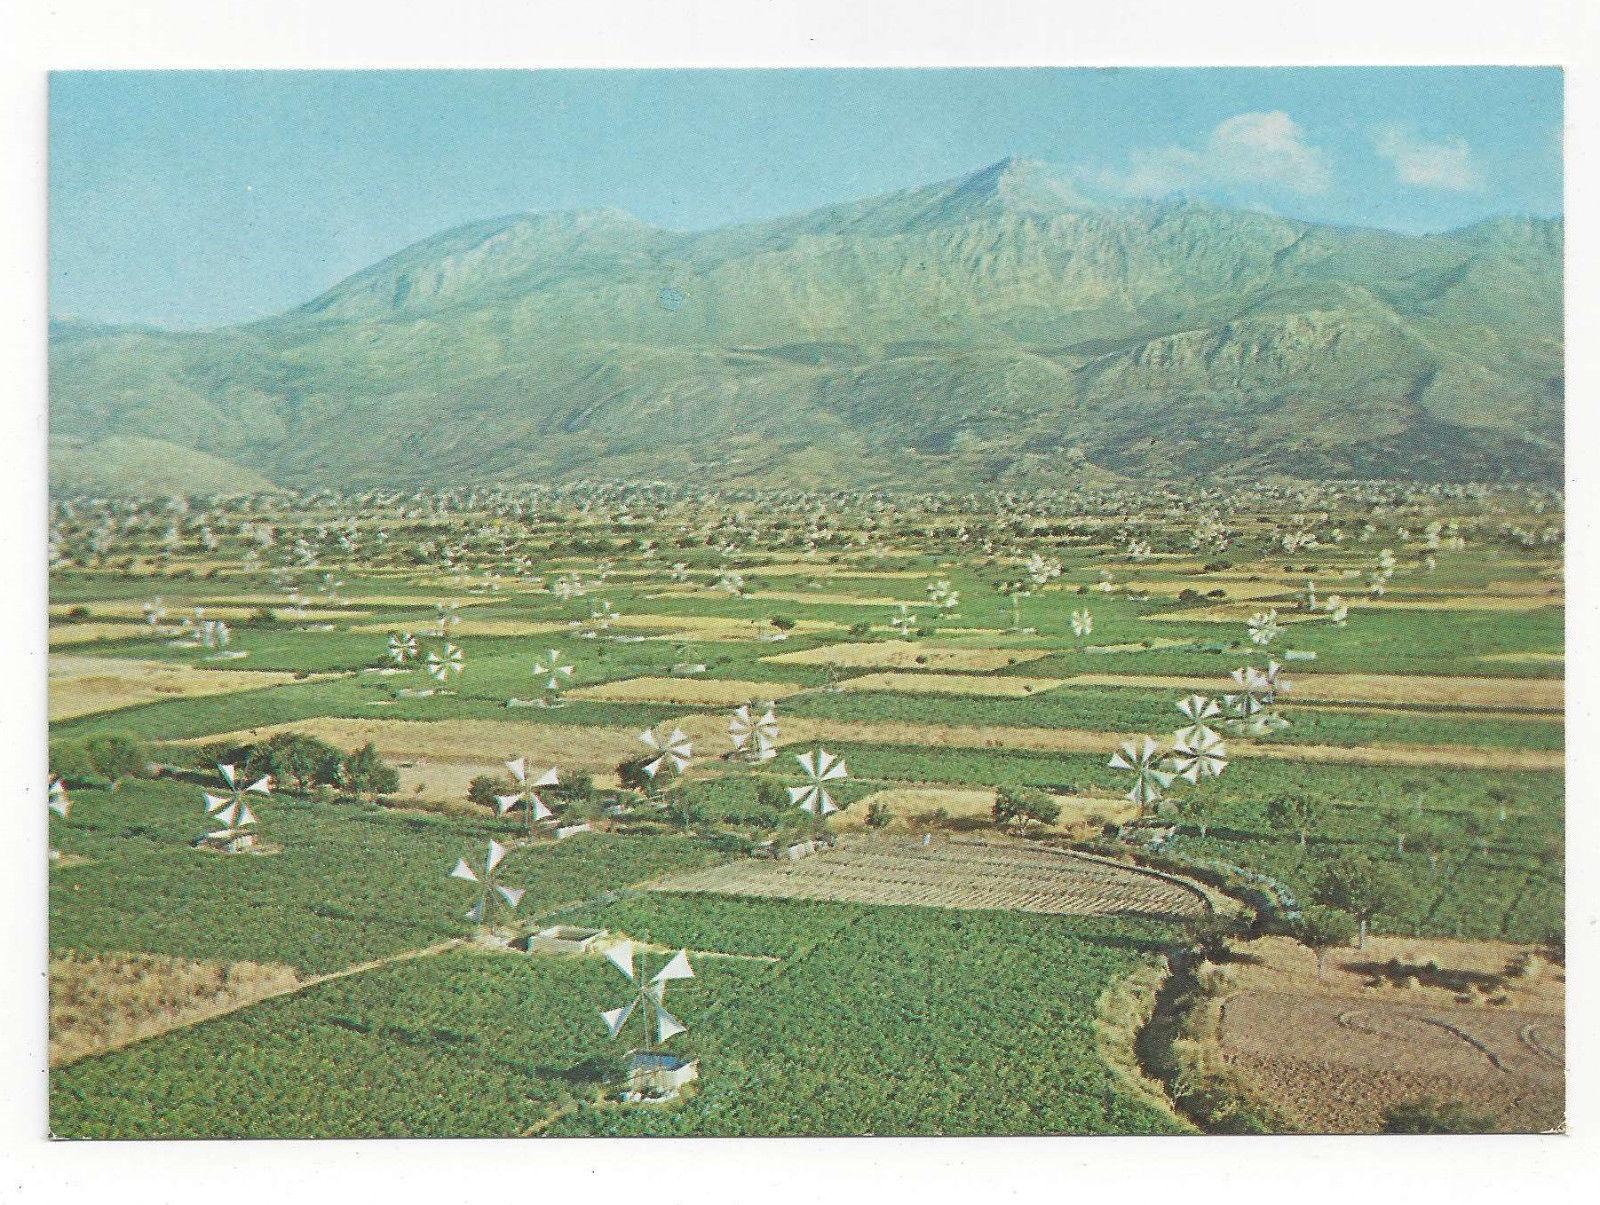 Greece Crete Lassithi Plateau Irrigation Windmills Aerial View Vtg Postcard 4X6